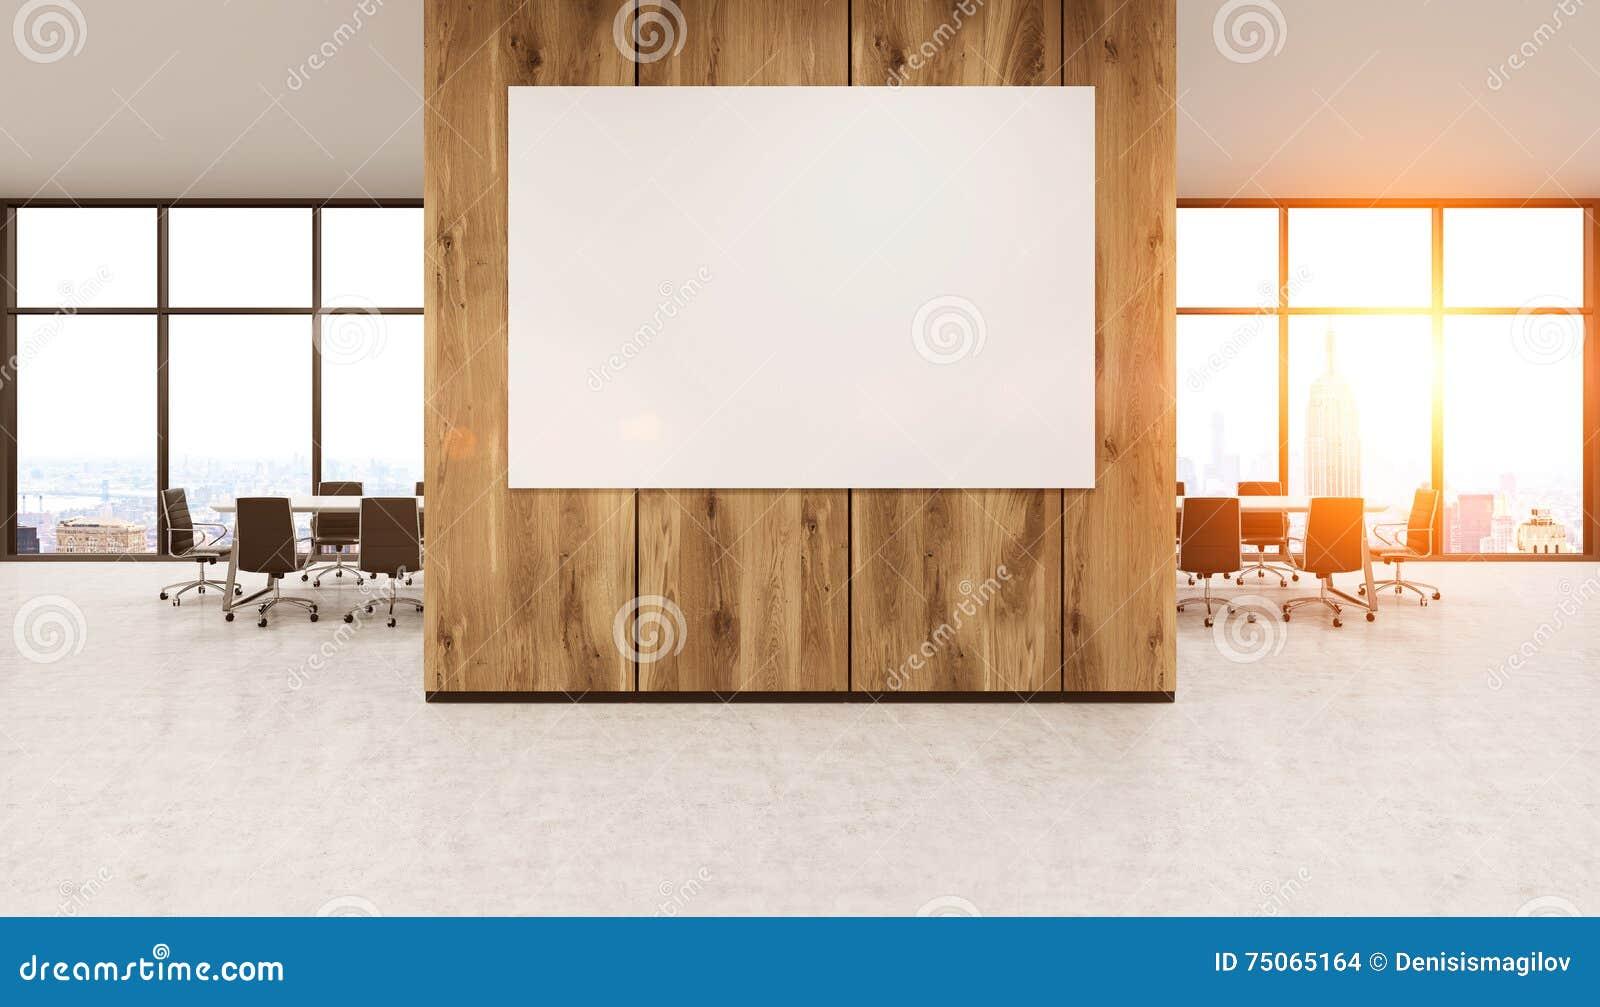 Whiteboard on wooden office wall stock illustration for Sunlight windows